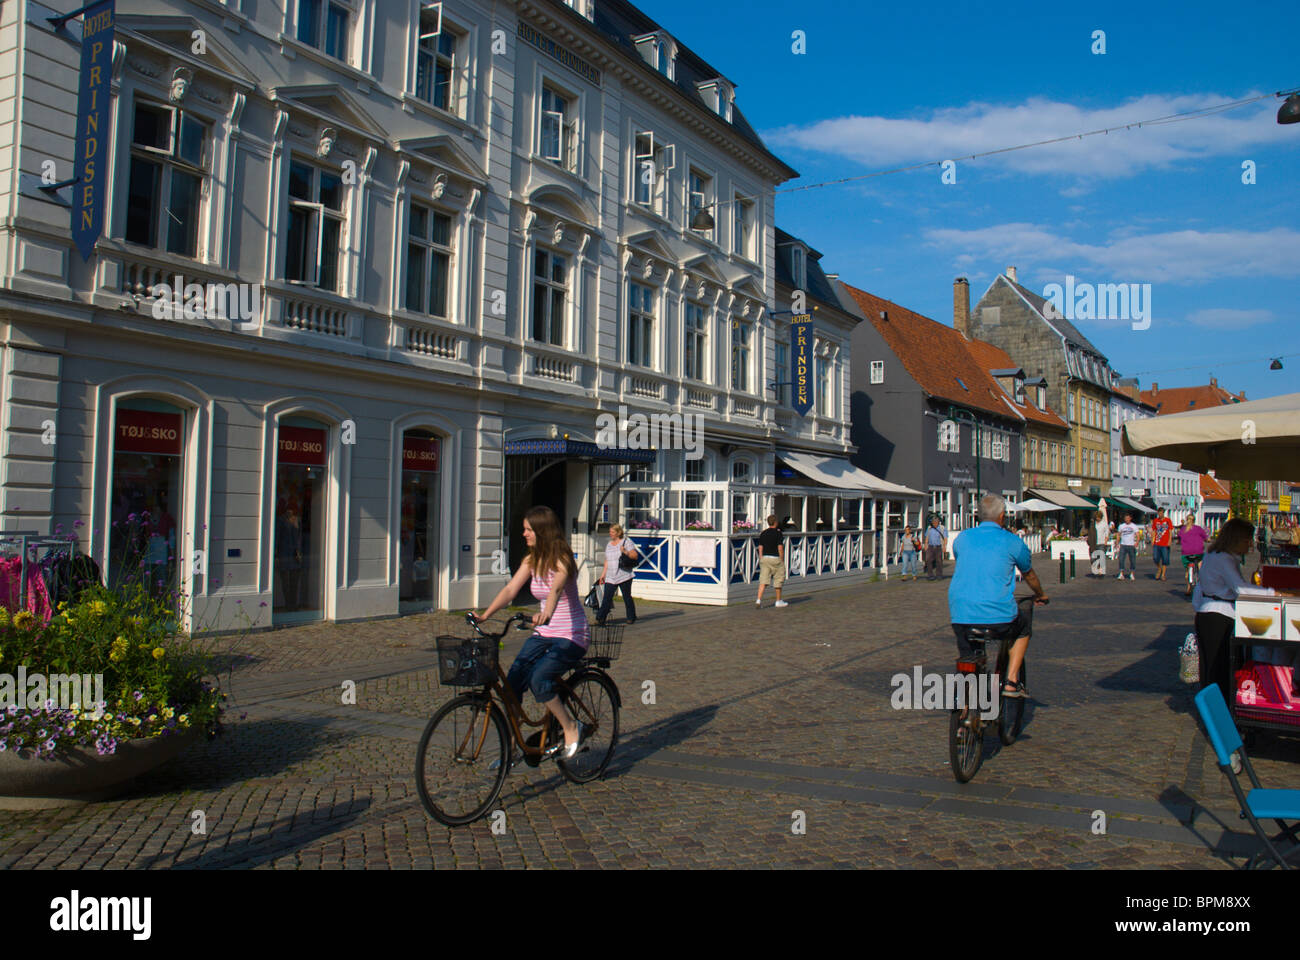 Algade main pedestrian street Roskilde Denmark Europe - Stock Image